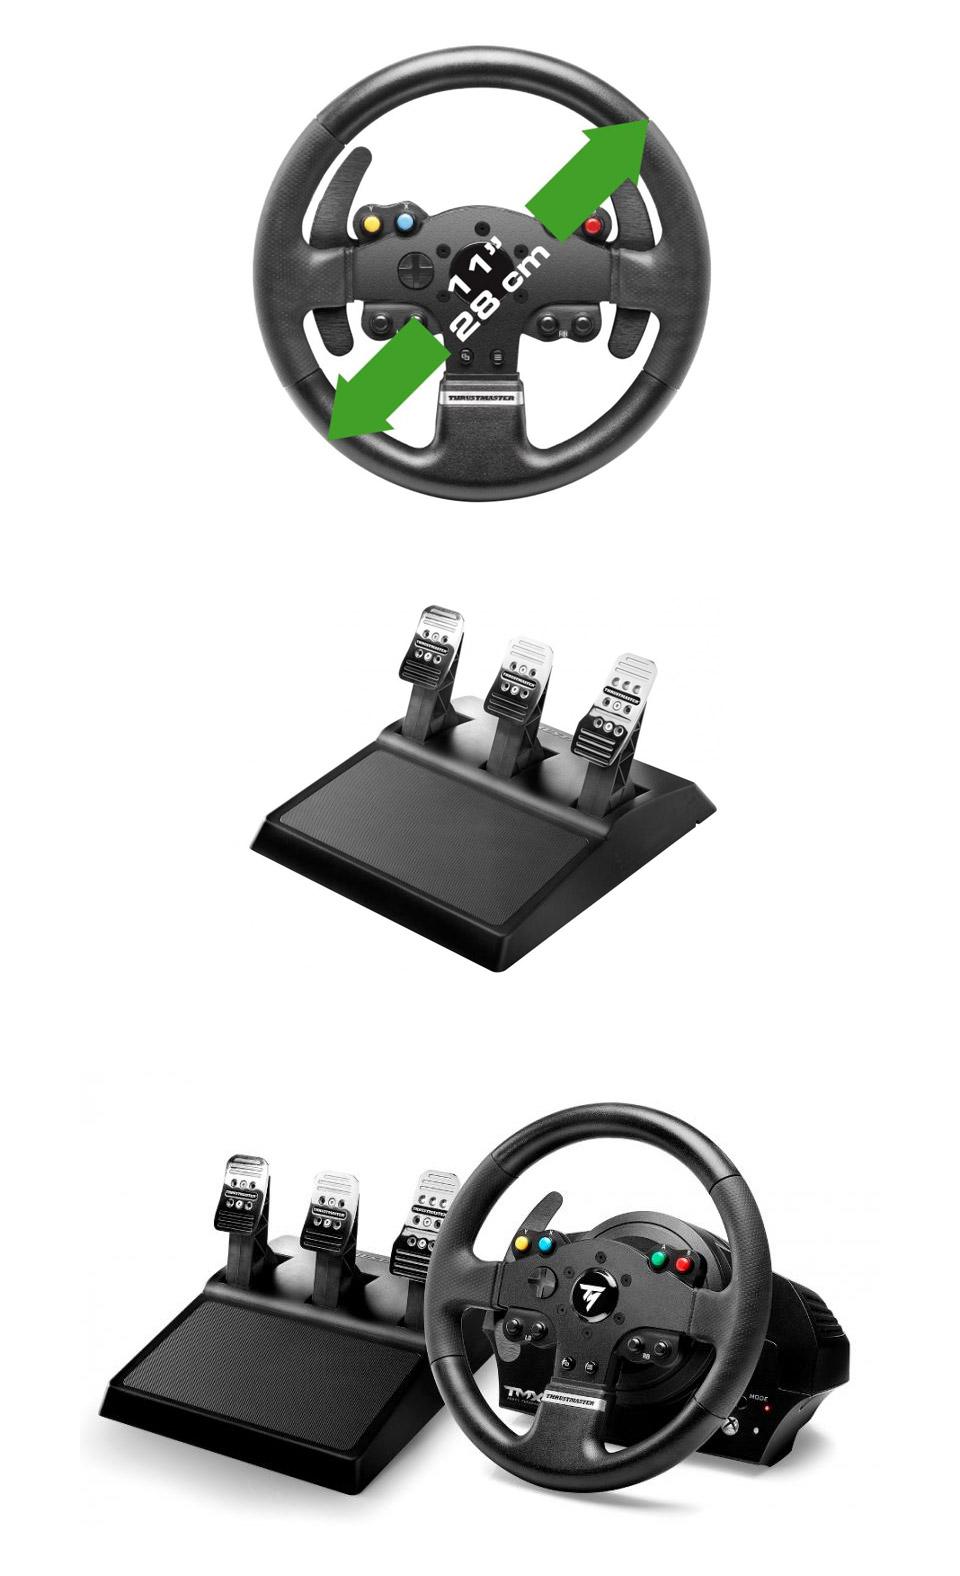 Thrustmaster Rudder Pedals Setup